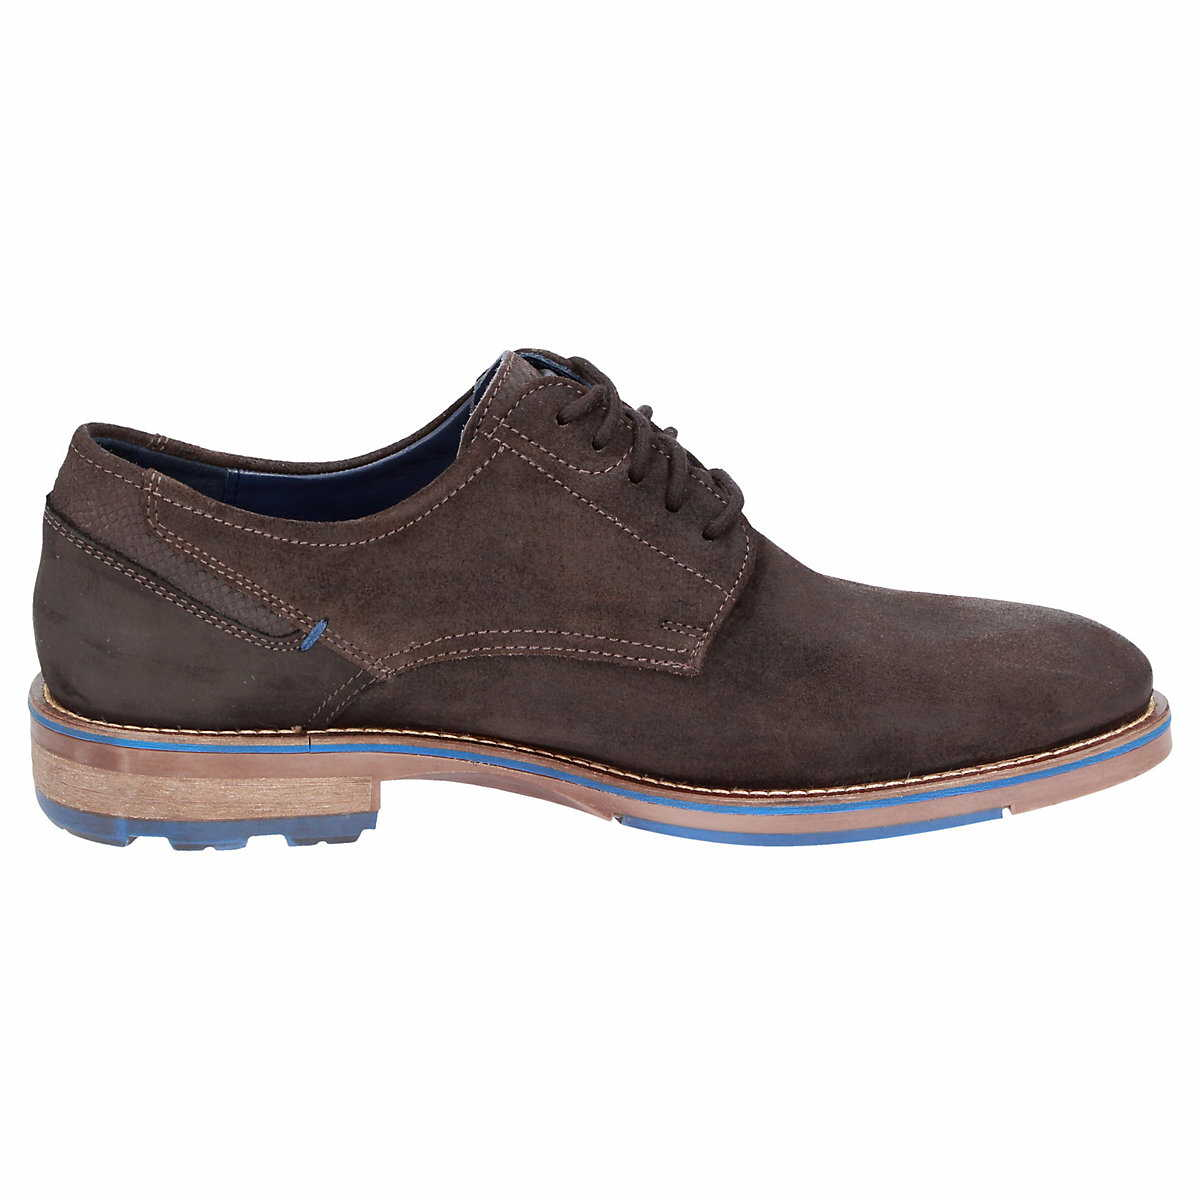 Sioux Business Schuhe Herrenschuhe Artemino-700 37012 Braun | Herrenschuhe BZ8Ay